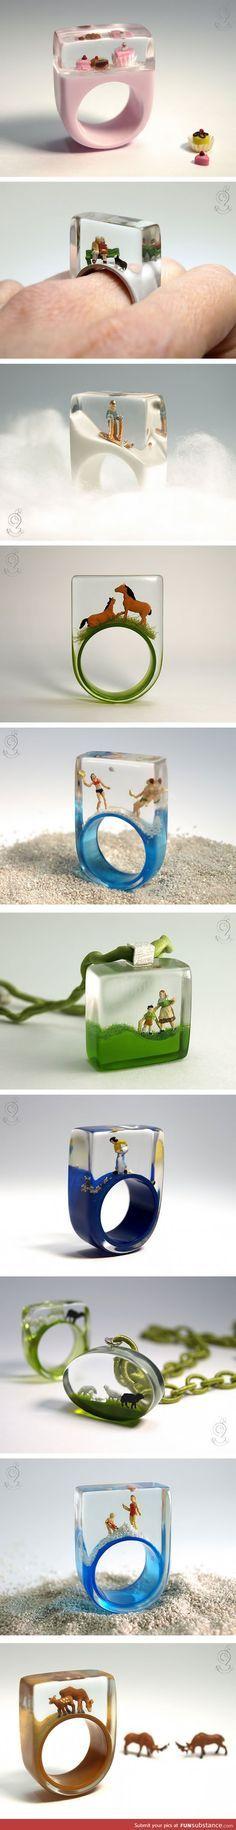 Diy resin jewelry scenes